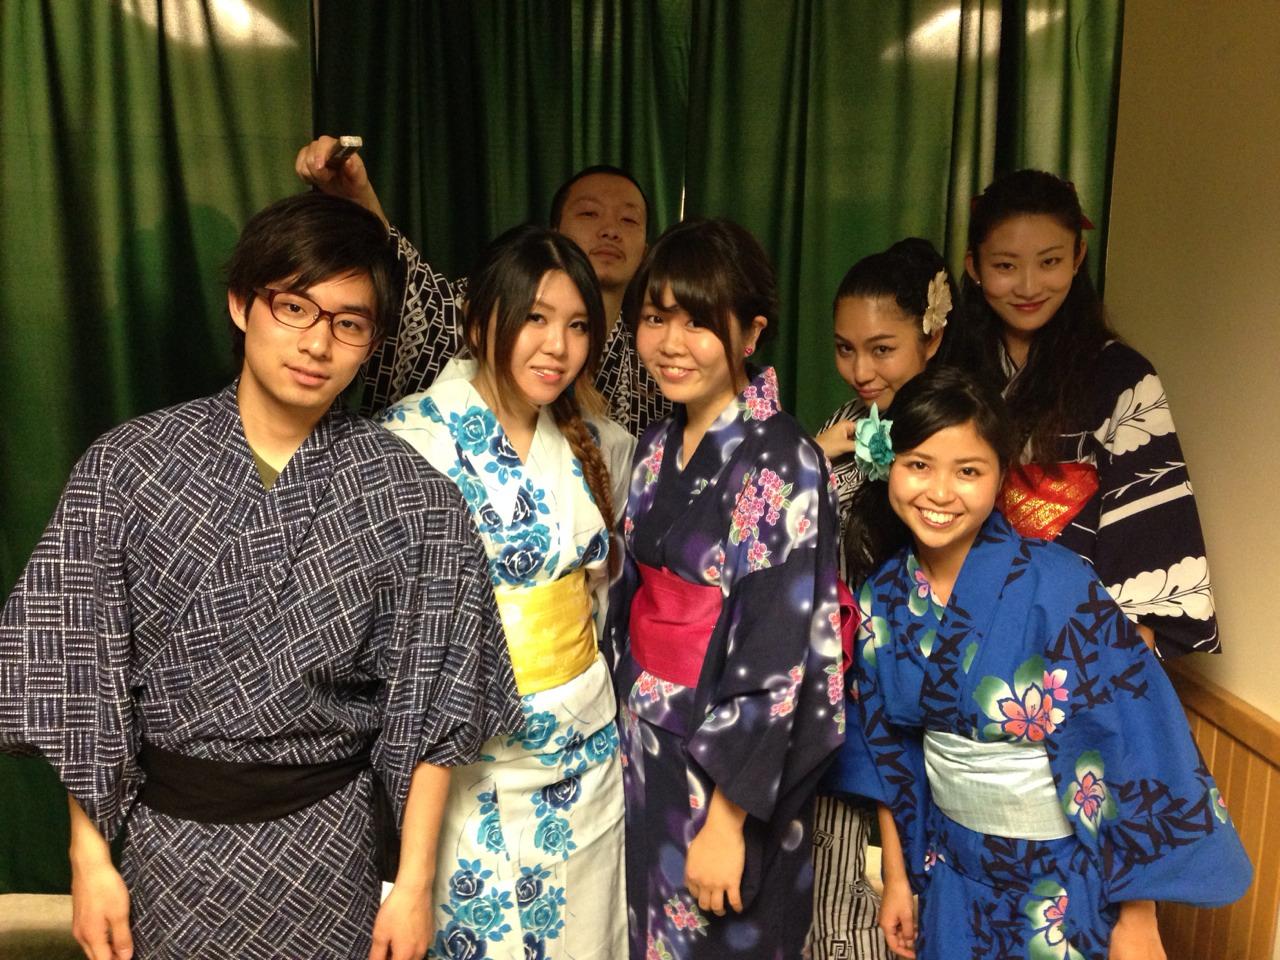 Yukata Japanese Kimono for Summer Festival